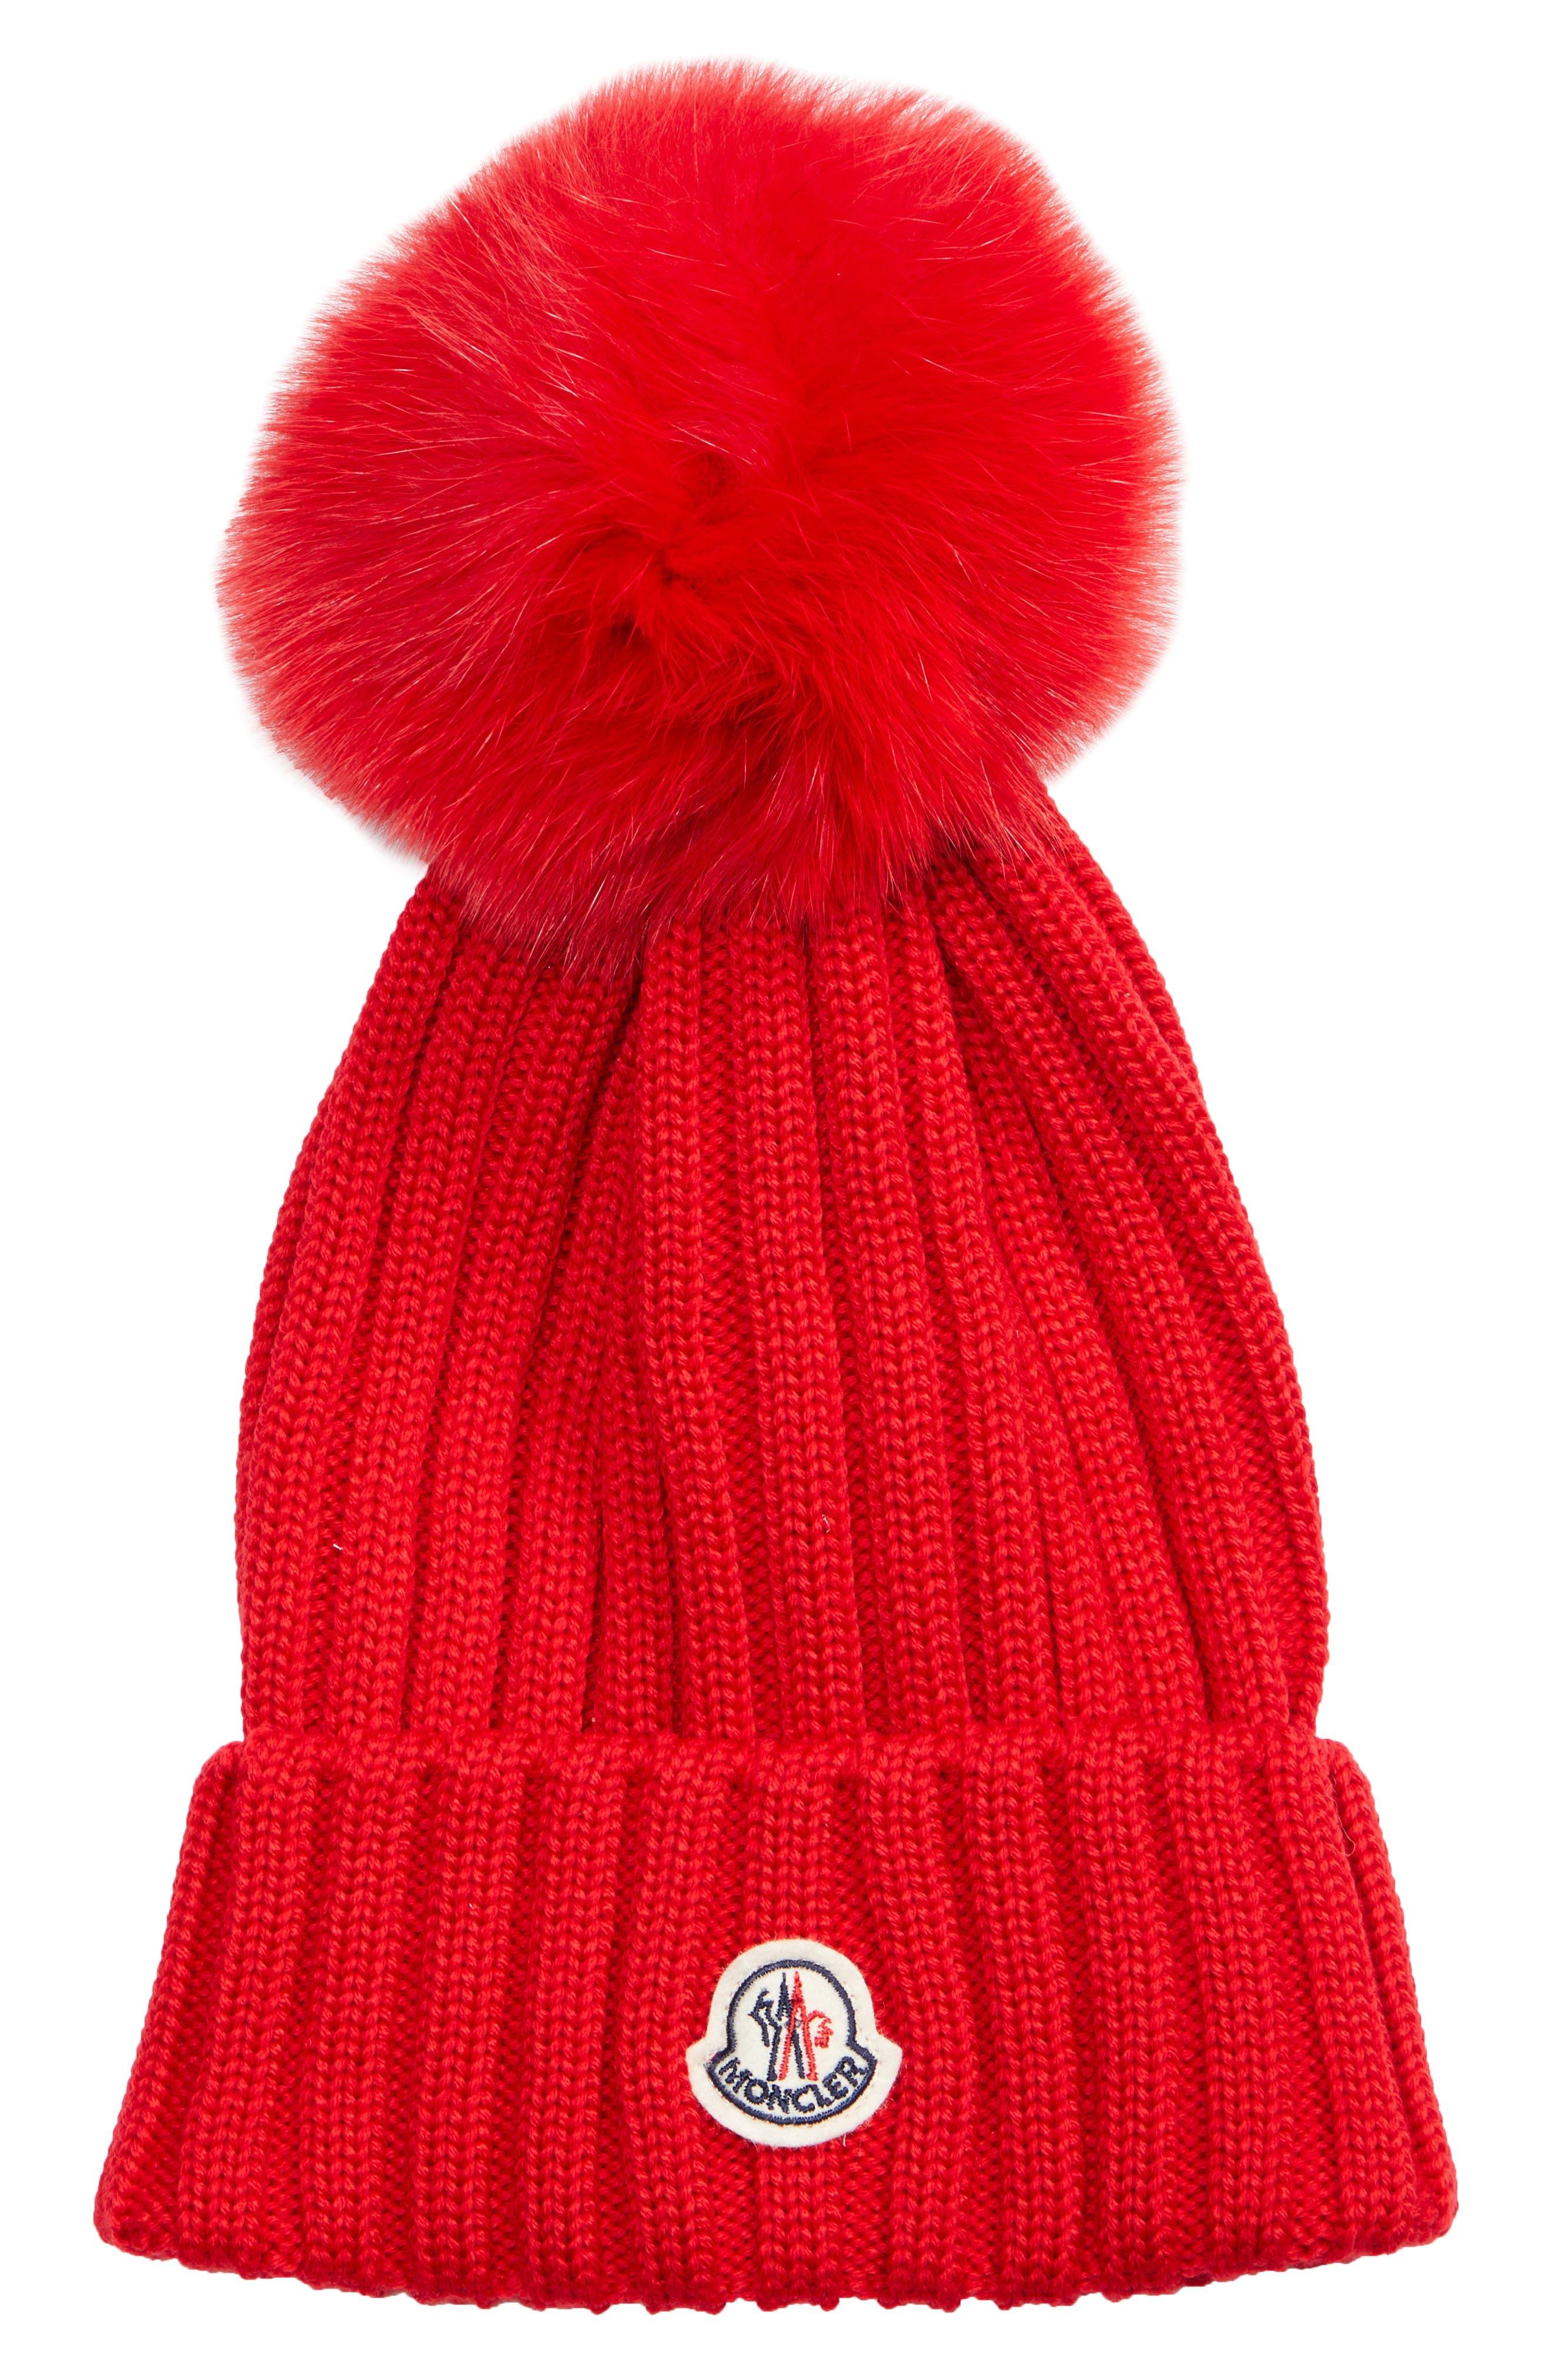 Moncler Genuine Fox Fur Pom Wool Beanie -